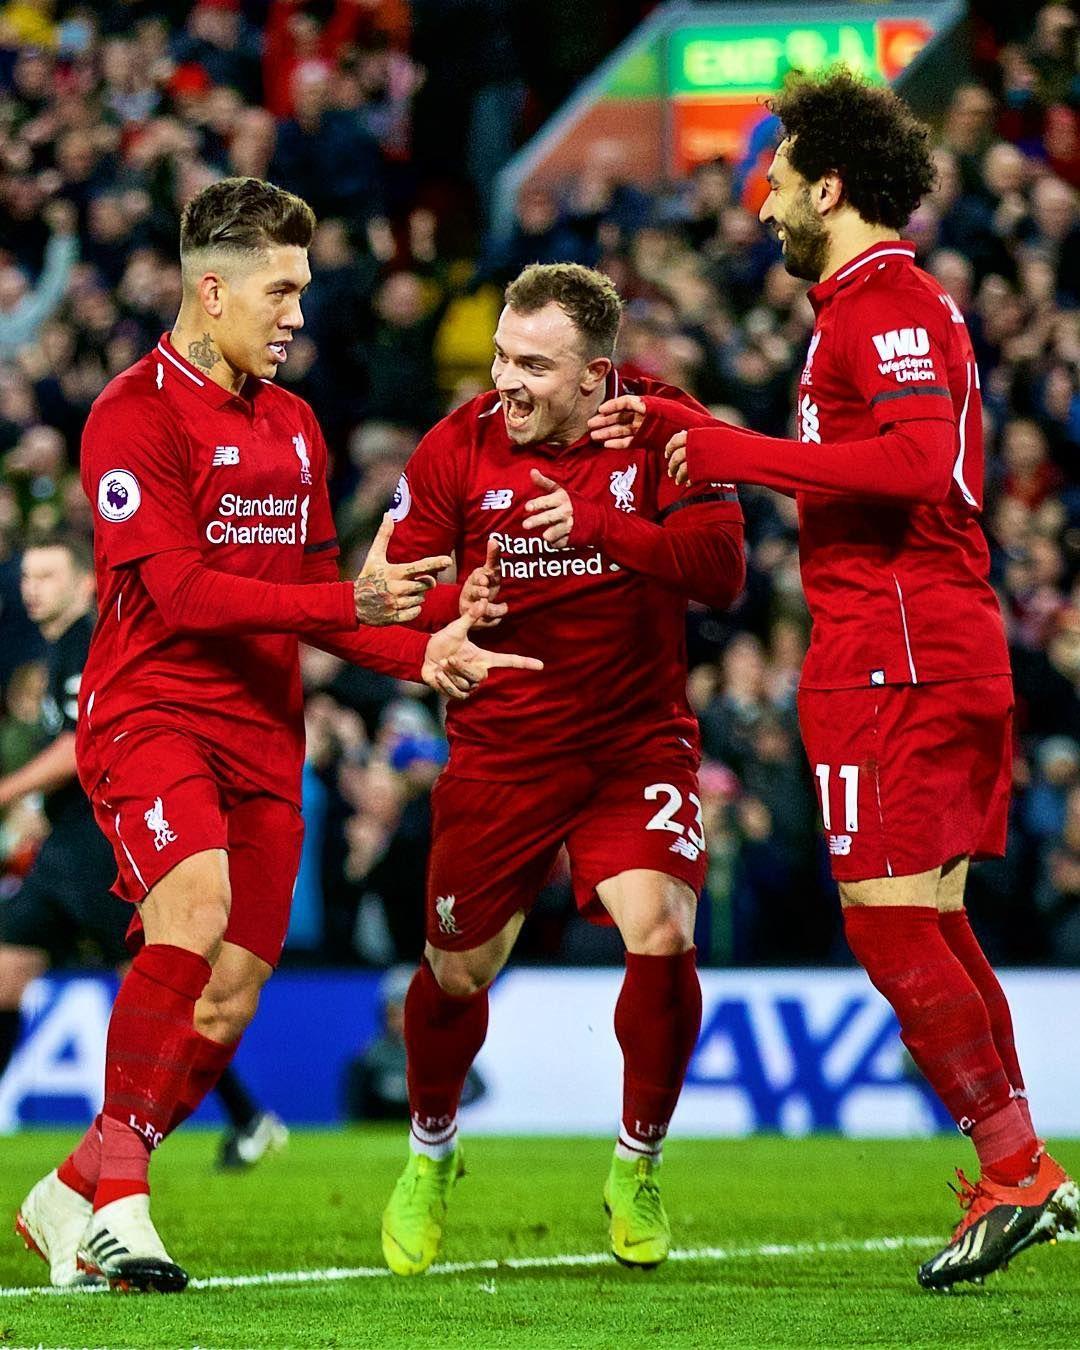 Hat Trick Hero Lfc Liverpoolfc Liverpool Premierleague Livars Liverpool Football Liverpool Football Club Liverpool Anfield